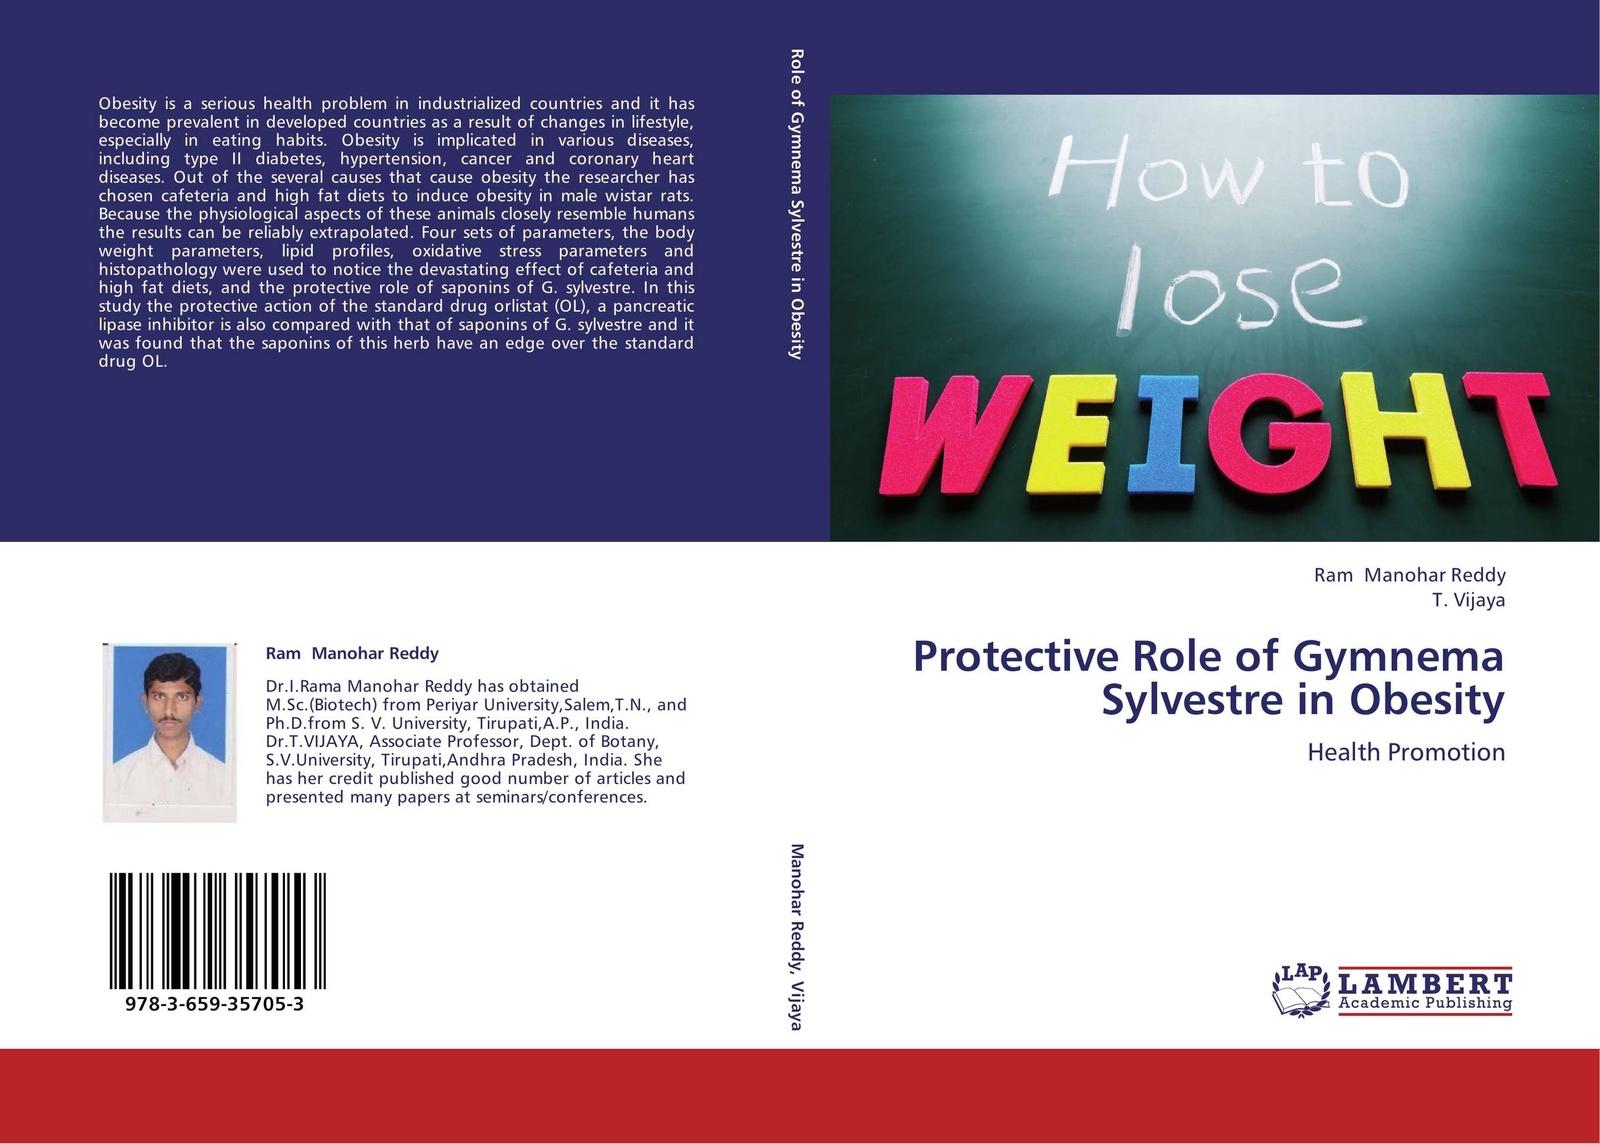 Ram Manohar Reddy and T. Vijaya Protective Role of Gymnema Sylvestre in Obesity histopathology